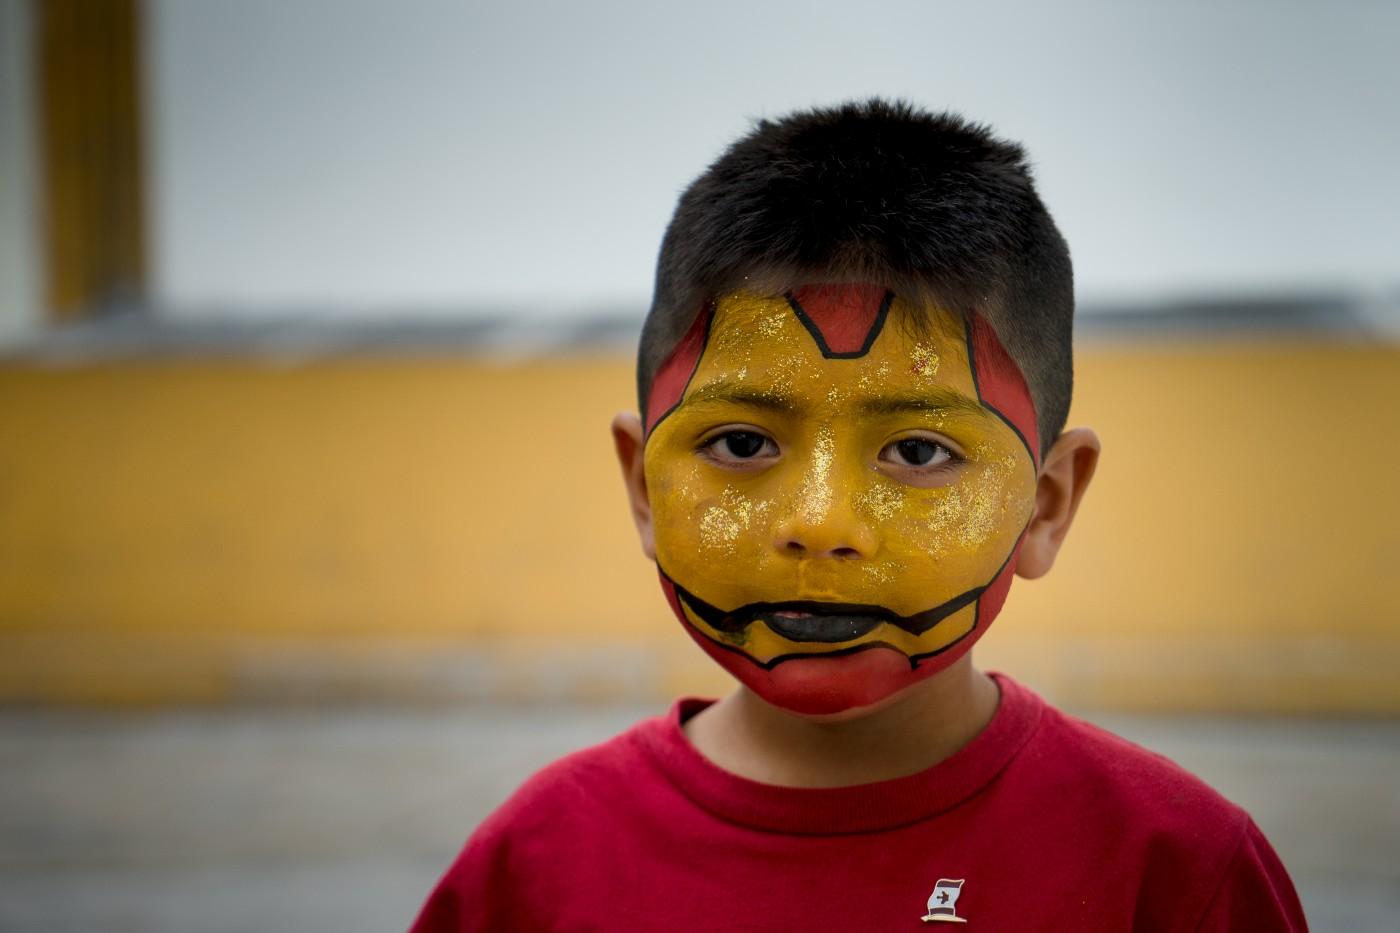 Allan Lissner, </span><span><em>KusiROSTROS its 4th Annual Health and Education Day, San Martin de Porres</em>, </span><span>2014